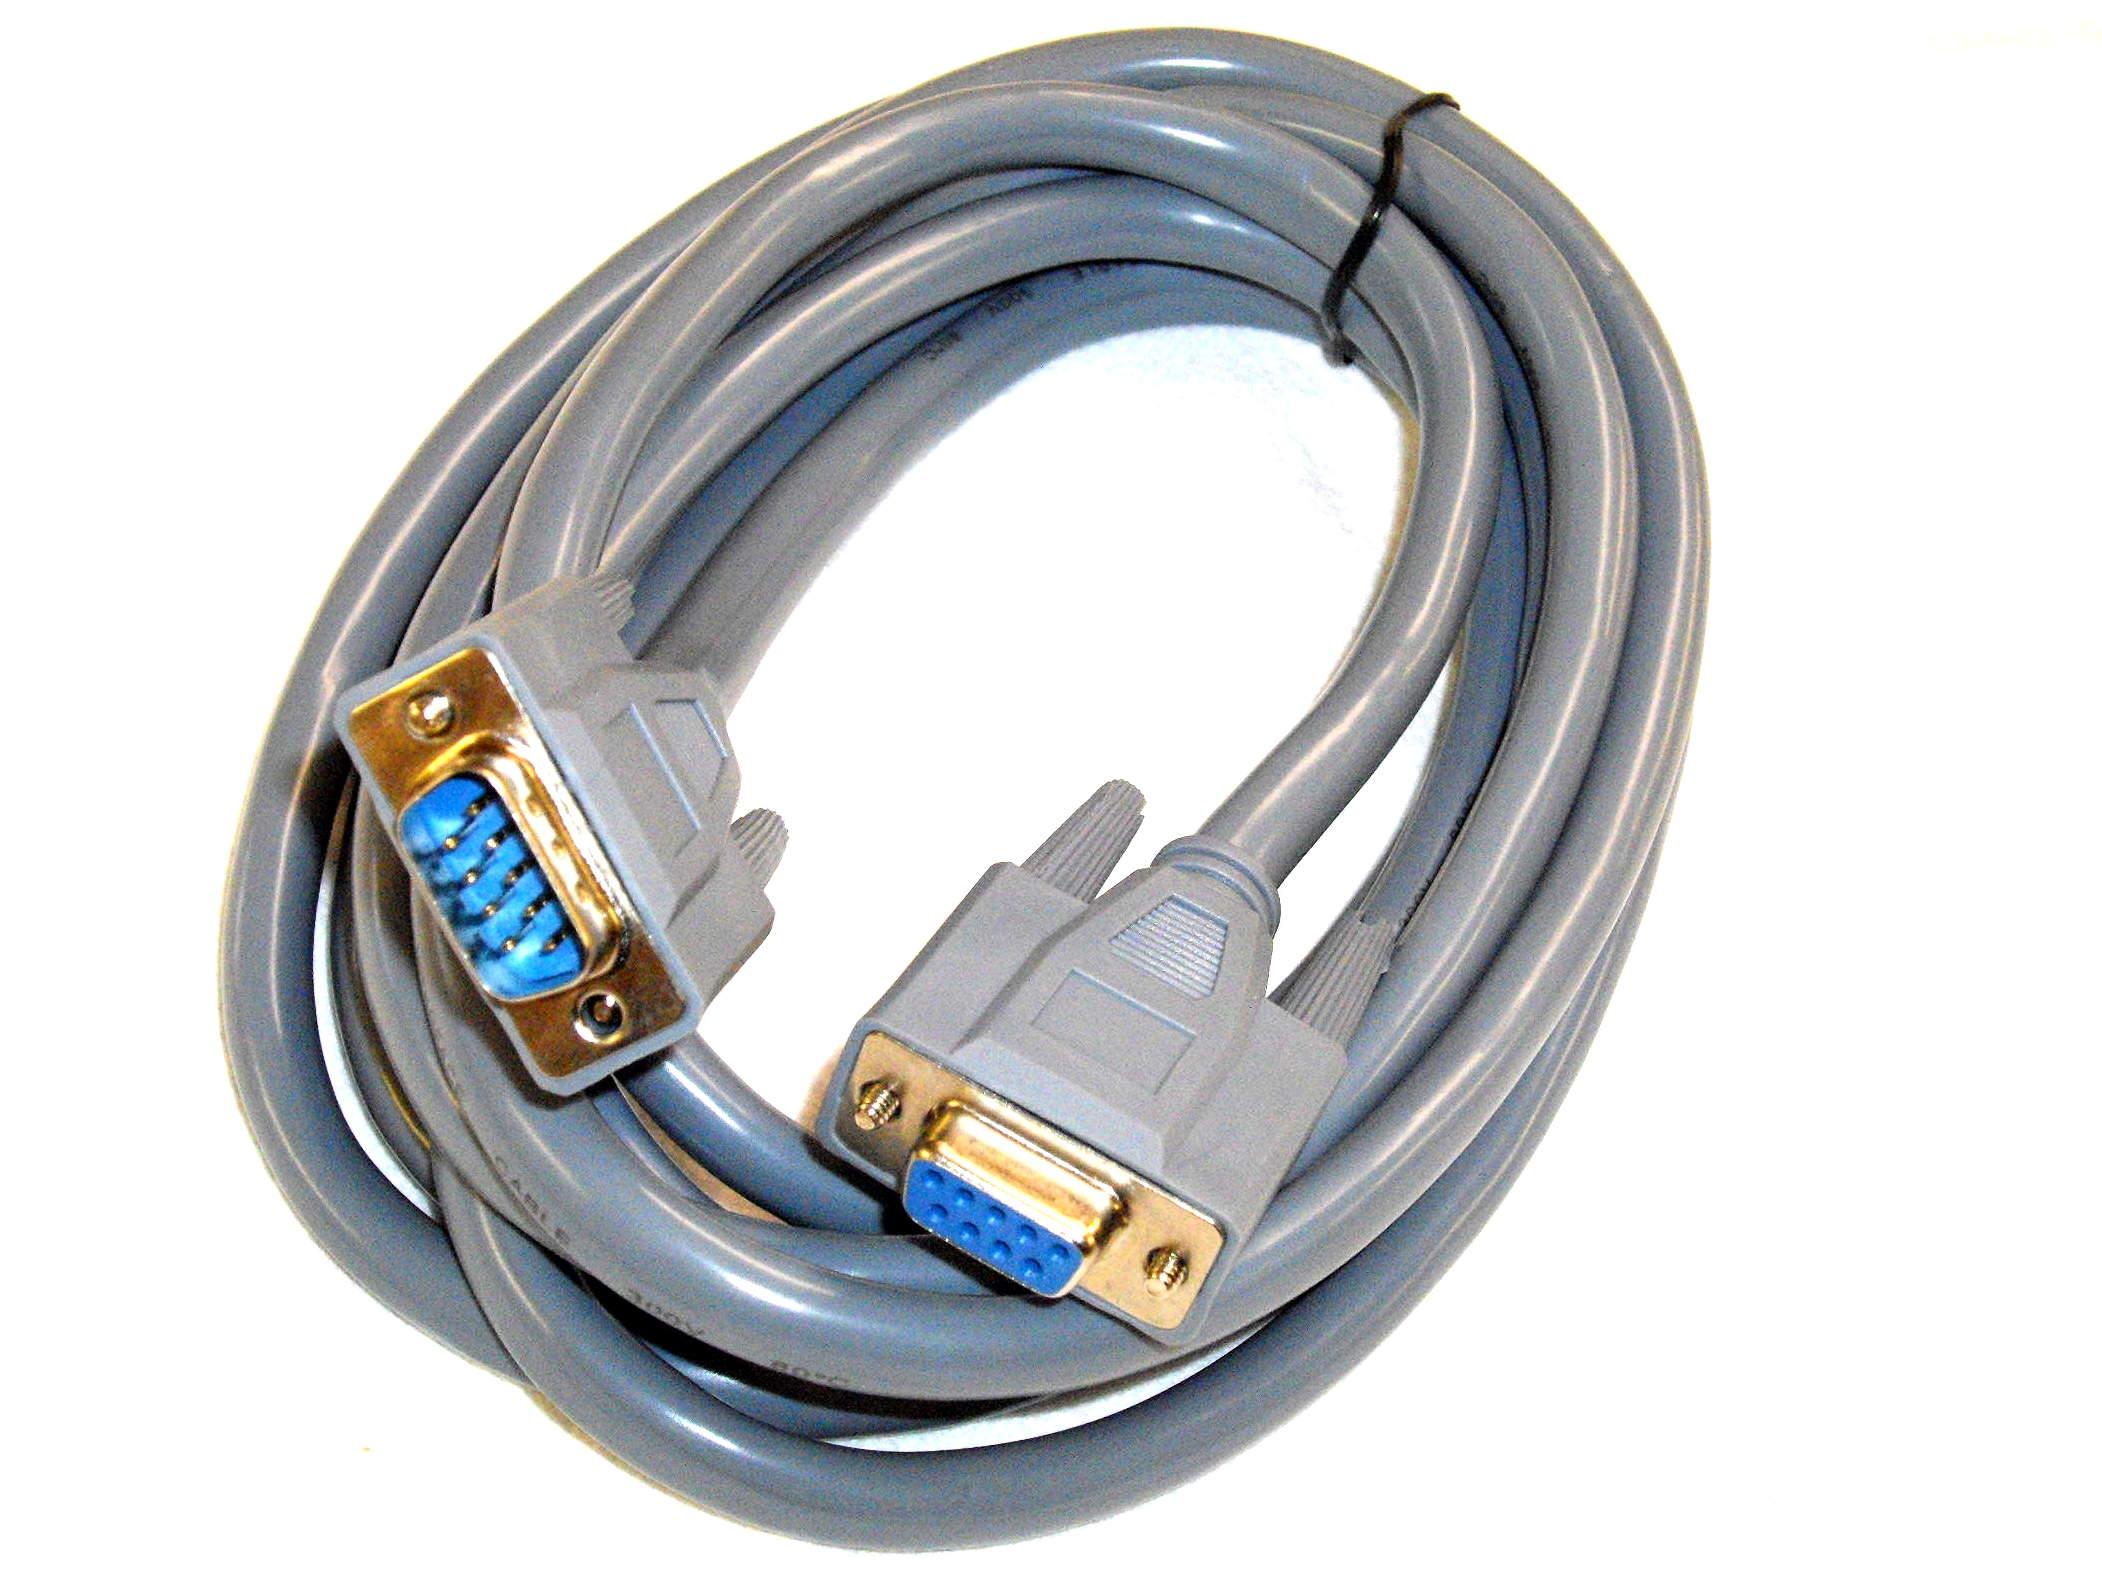 6pol/9pin D-Sub Kabel 0,25mm², 3m, ST-BU, MechaPlus CNC-Modellbau ...